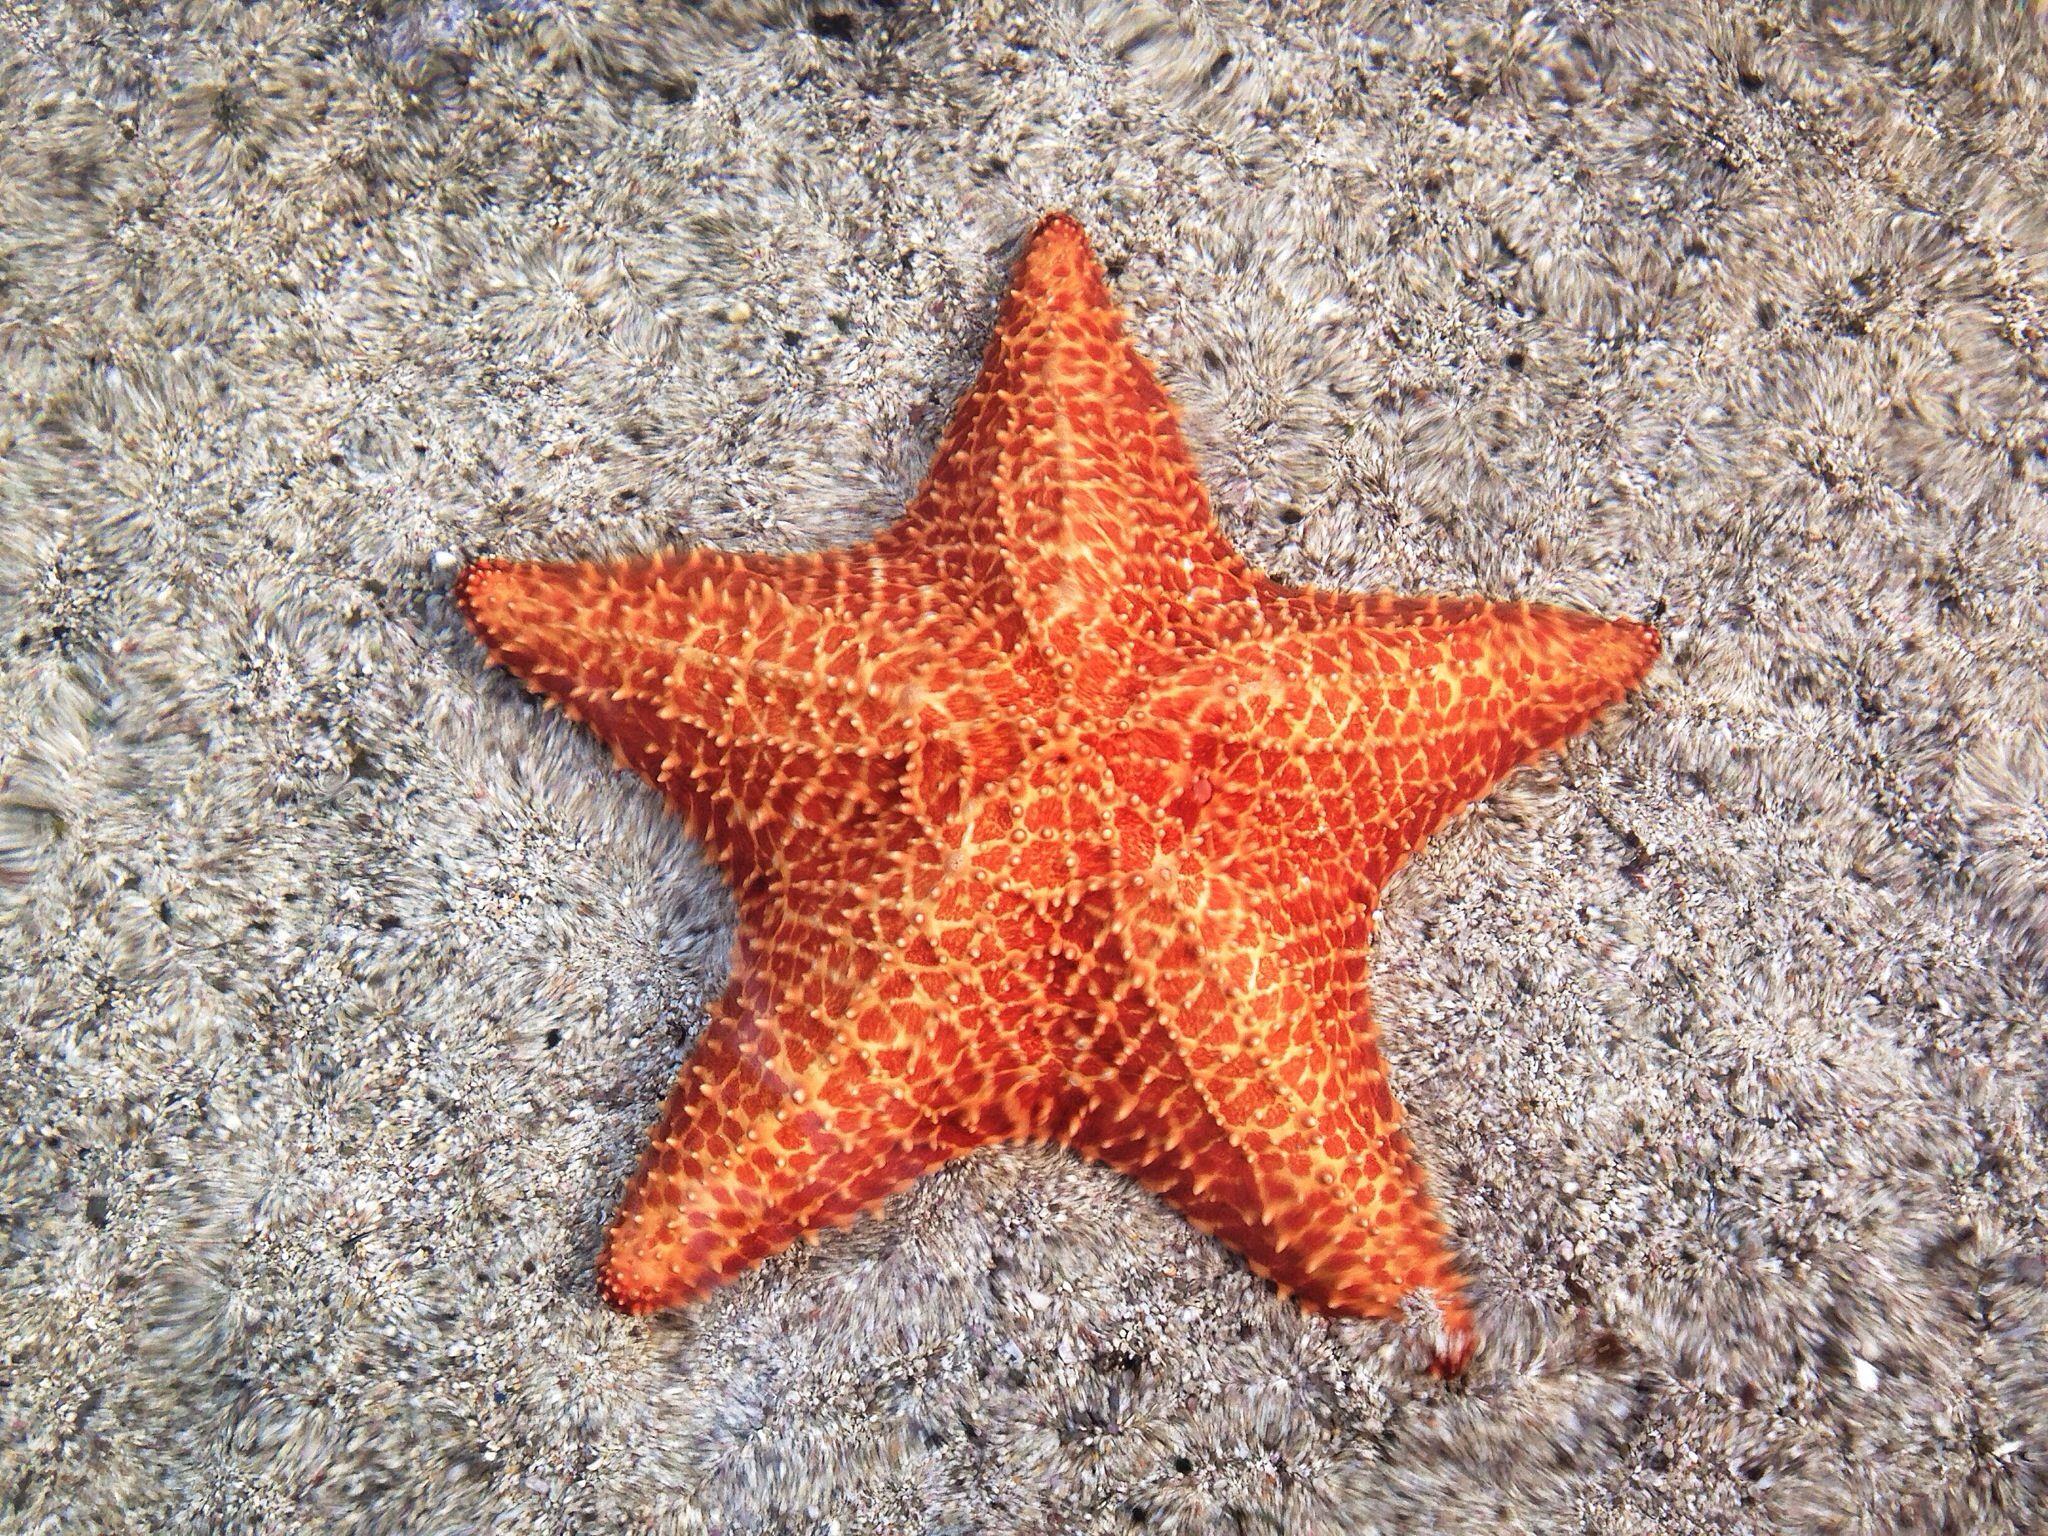 starfish a sea animal